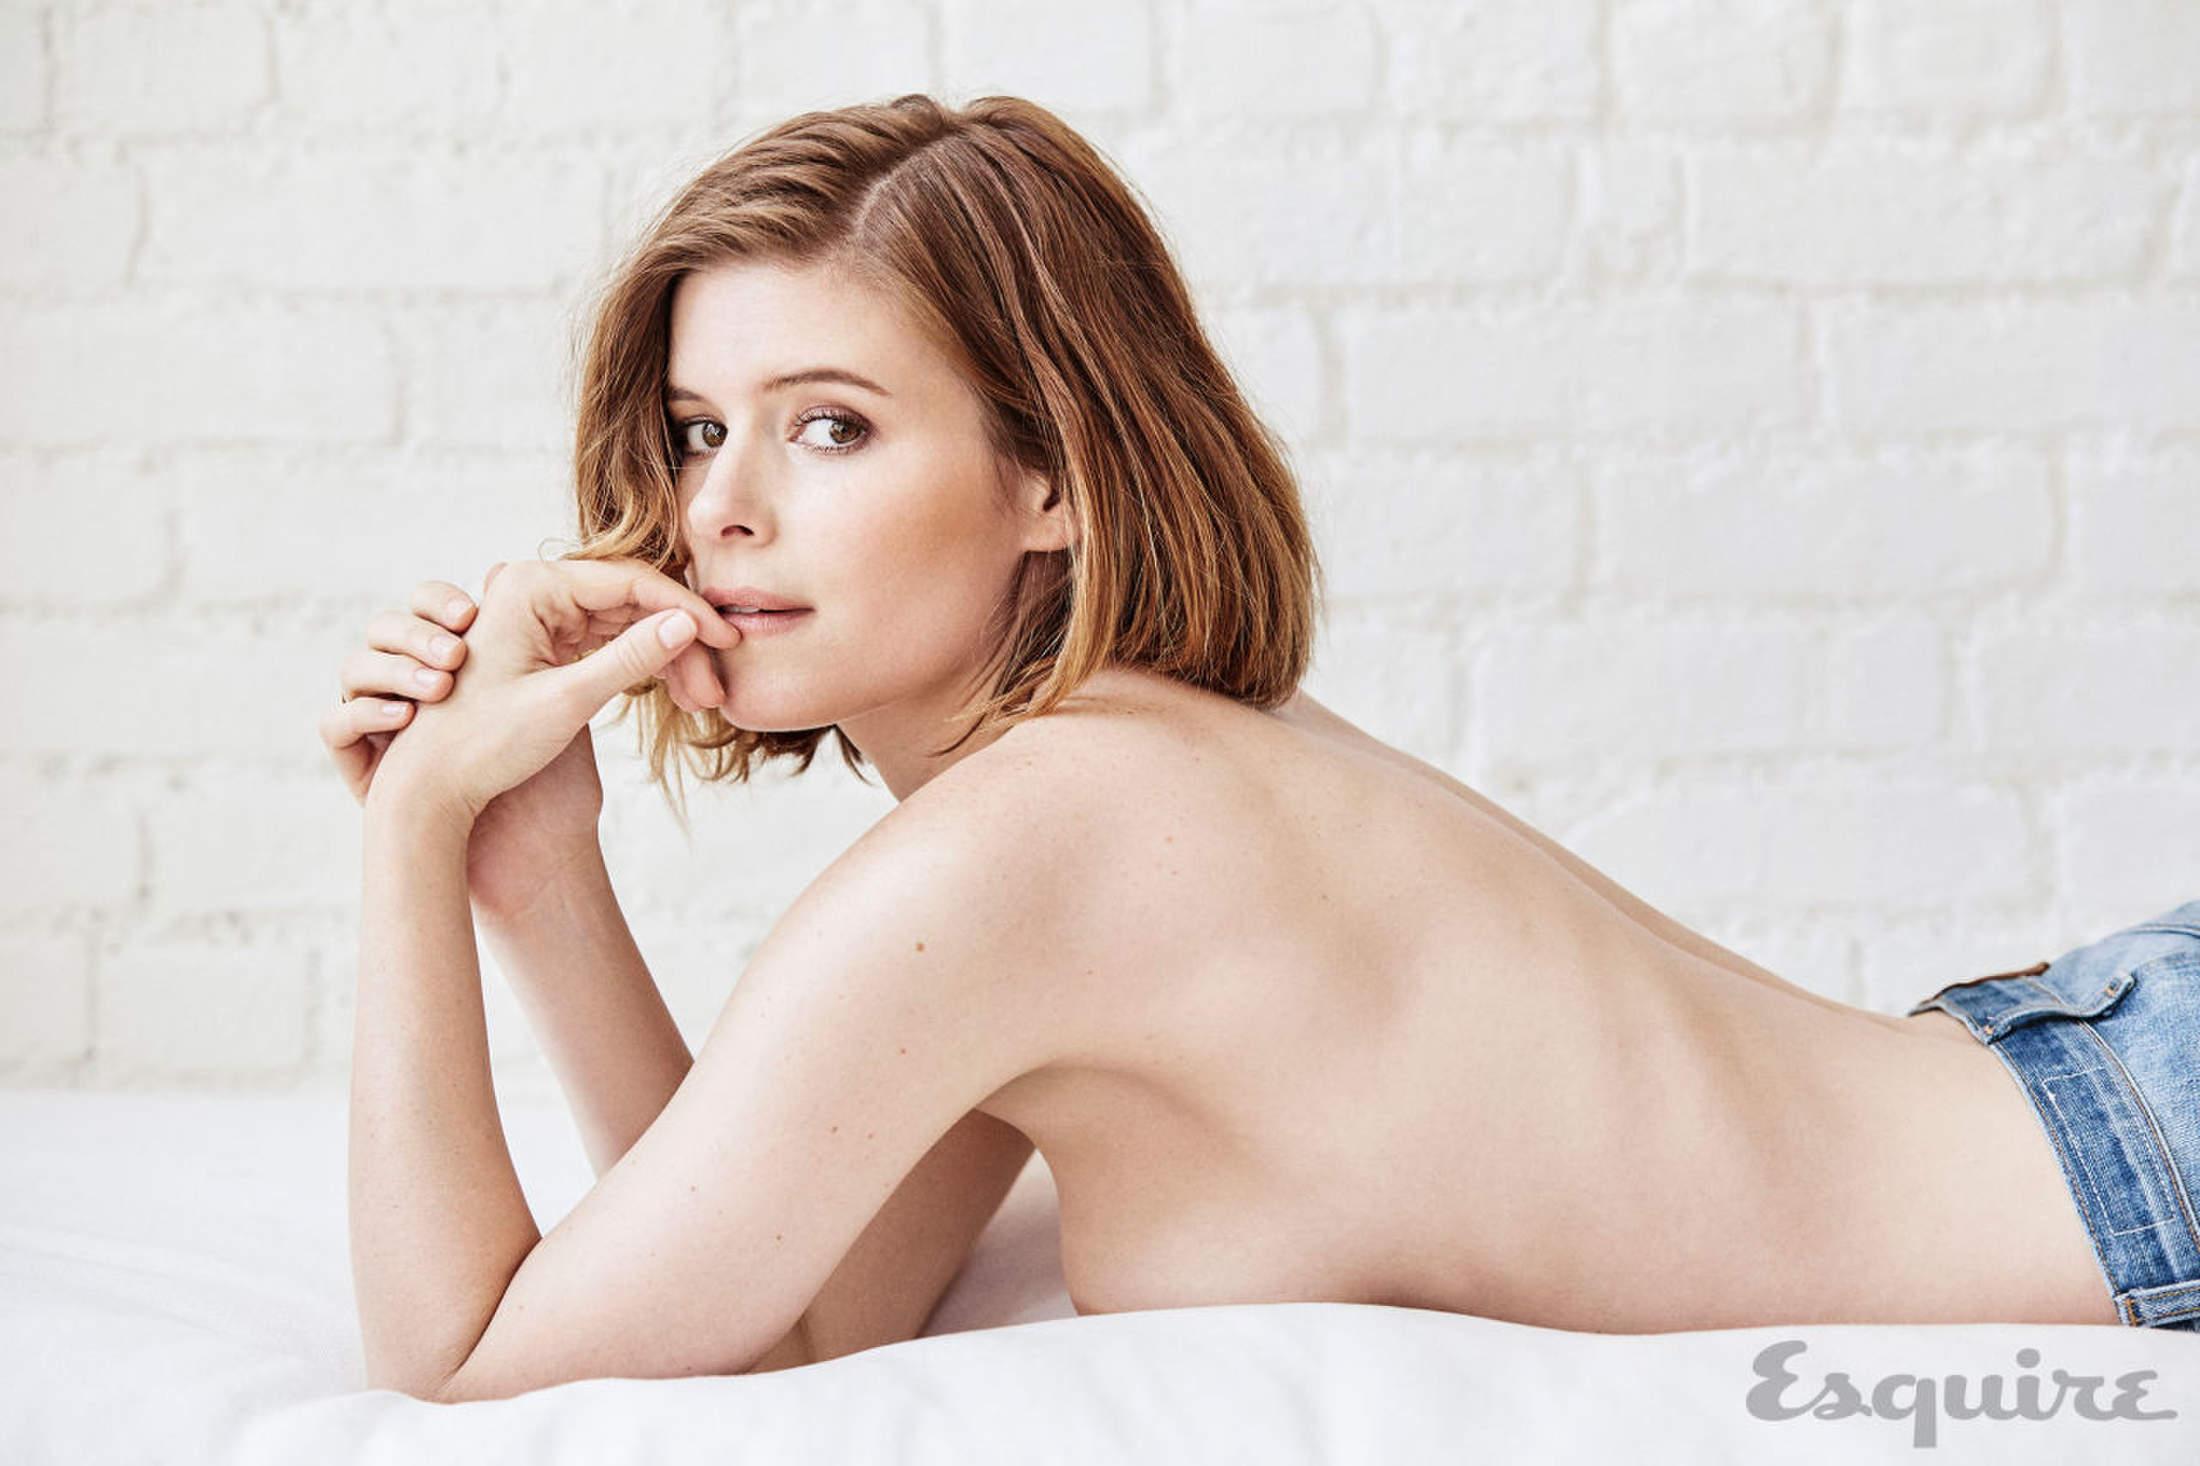 Kate Mara Hot Bikini